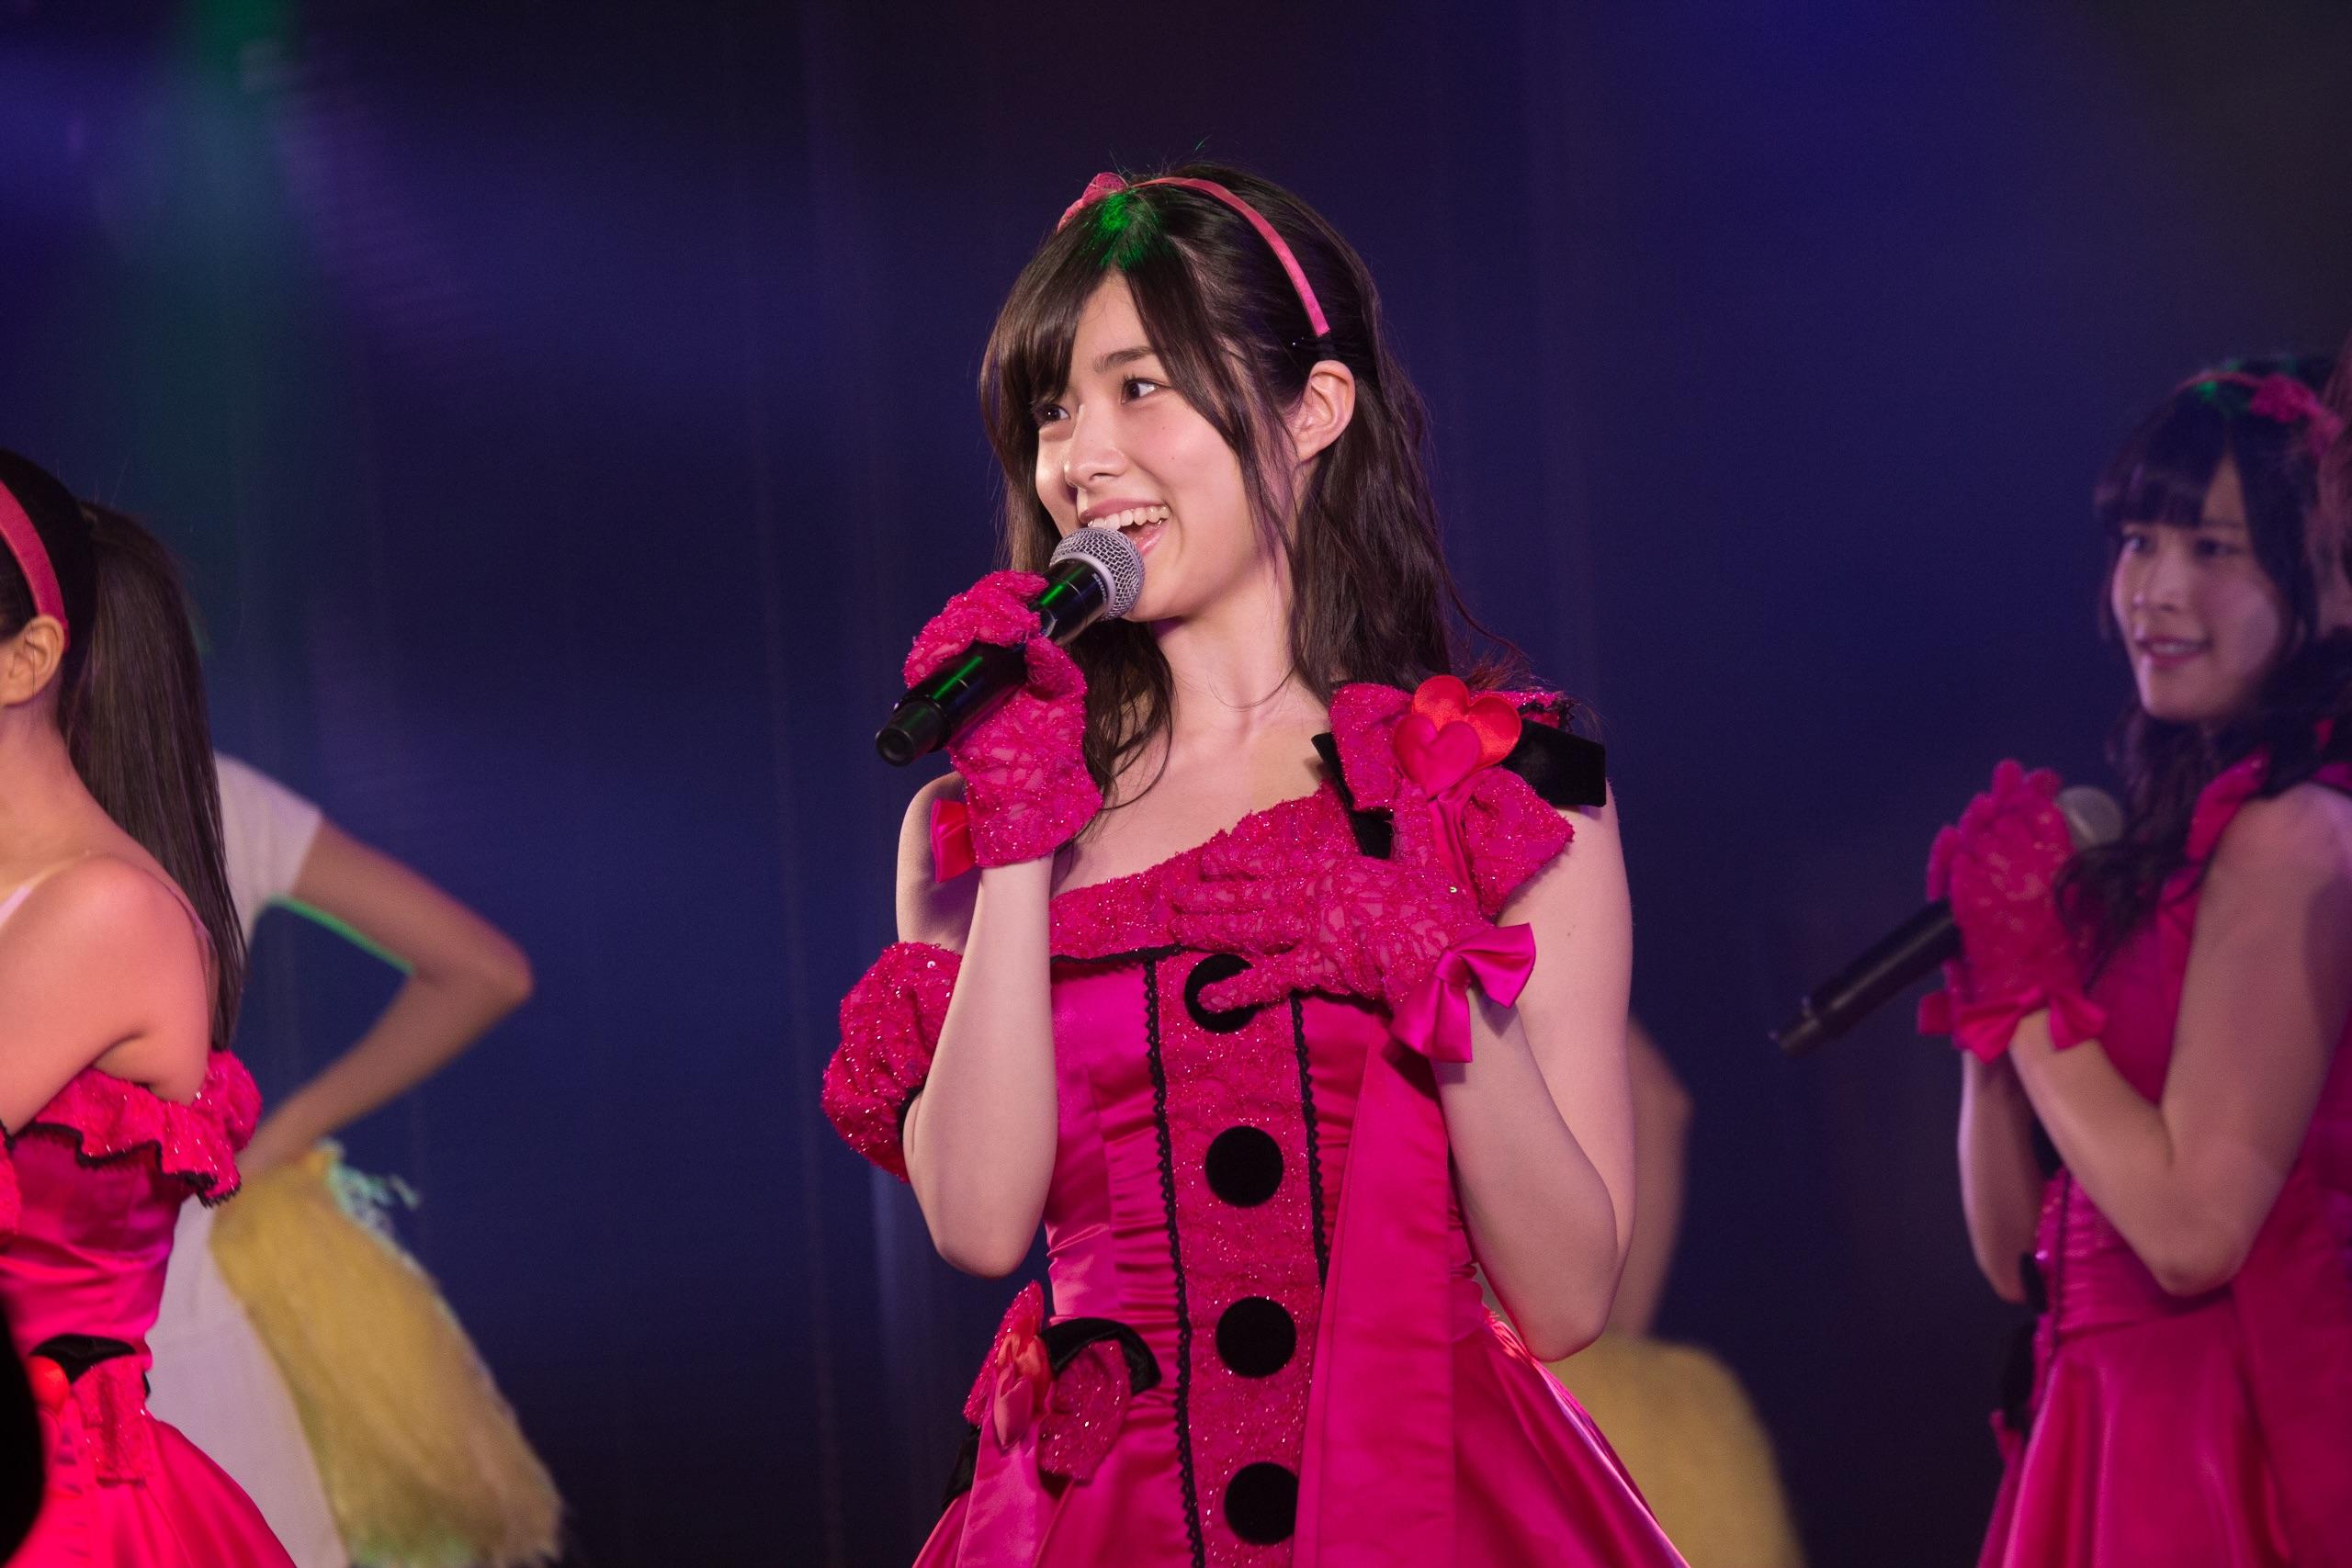 【AKB48】岩立沙穂応援スレ♪part44【さっほー】YouTube動画>65本 dailymotion>1本 ->画像>1367枚